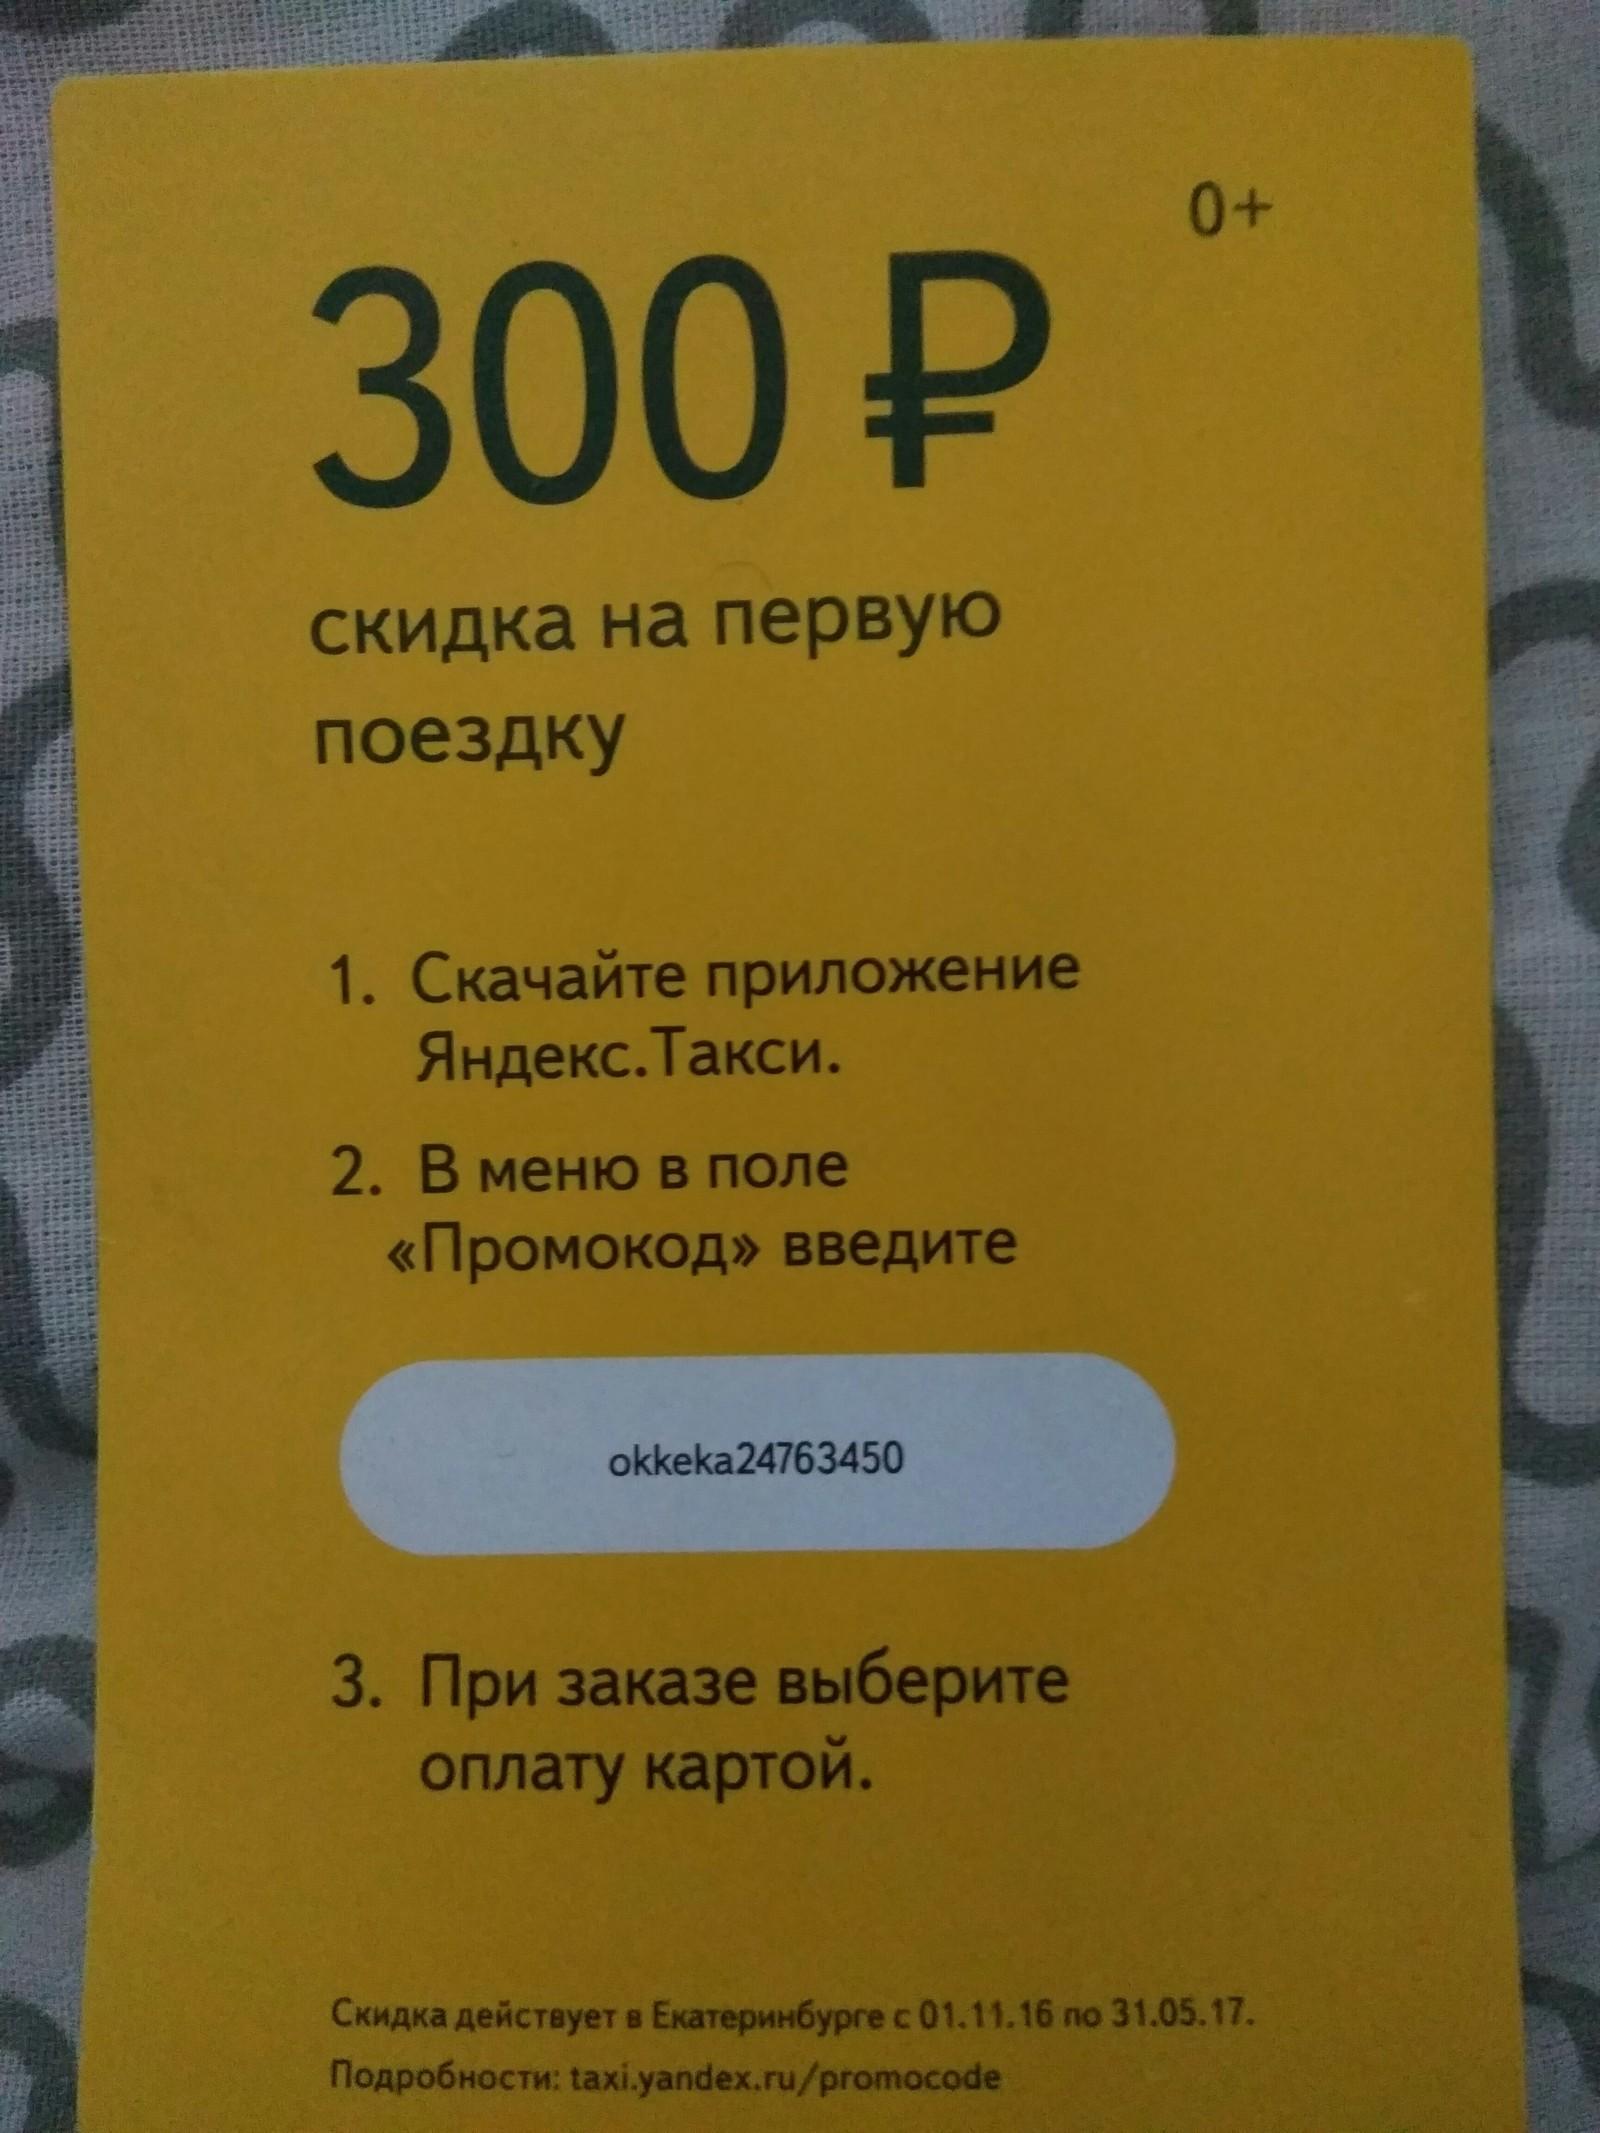 ЯндексТакси служба поддержки номер телефона  Инфо Такси